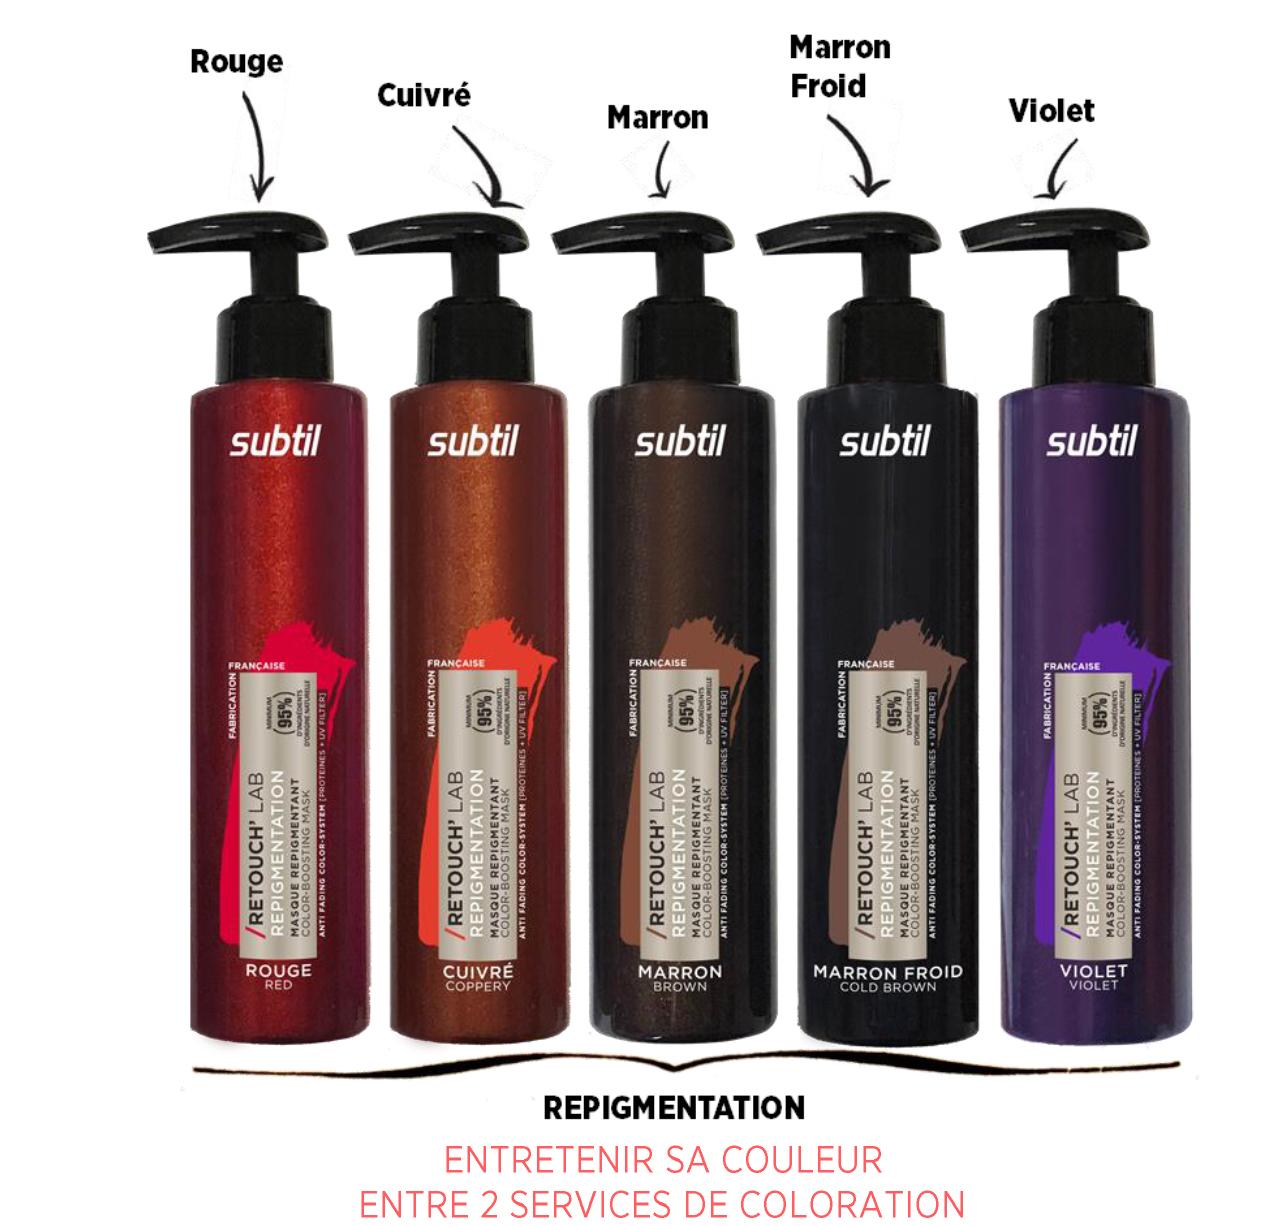 https://dimepar.com/img/cms/SUBTIL/retouch-lab-repigmentation_1.jpg